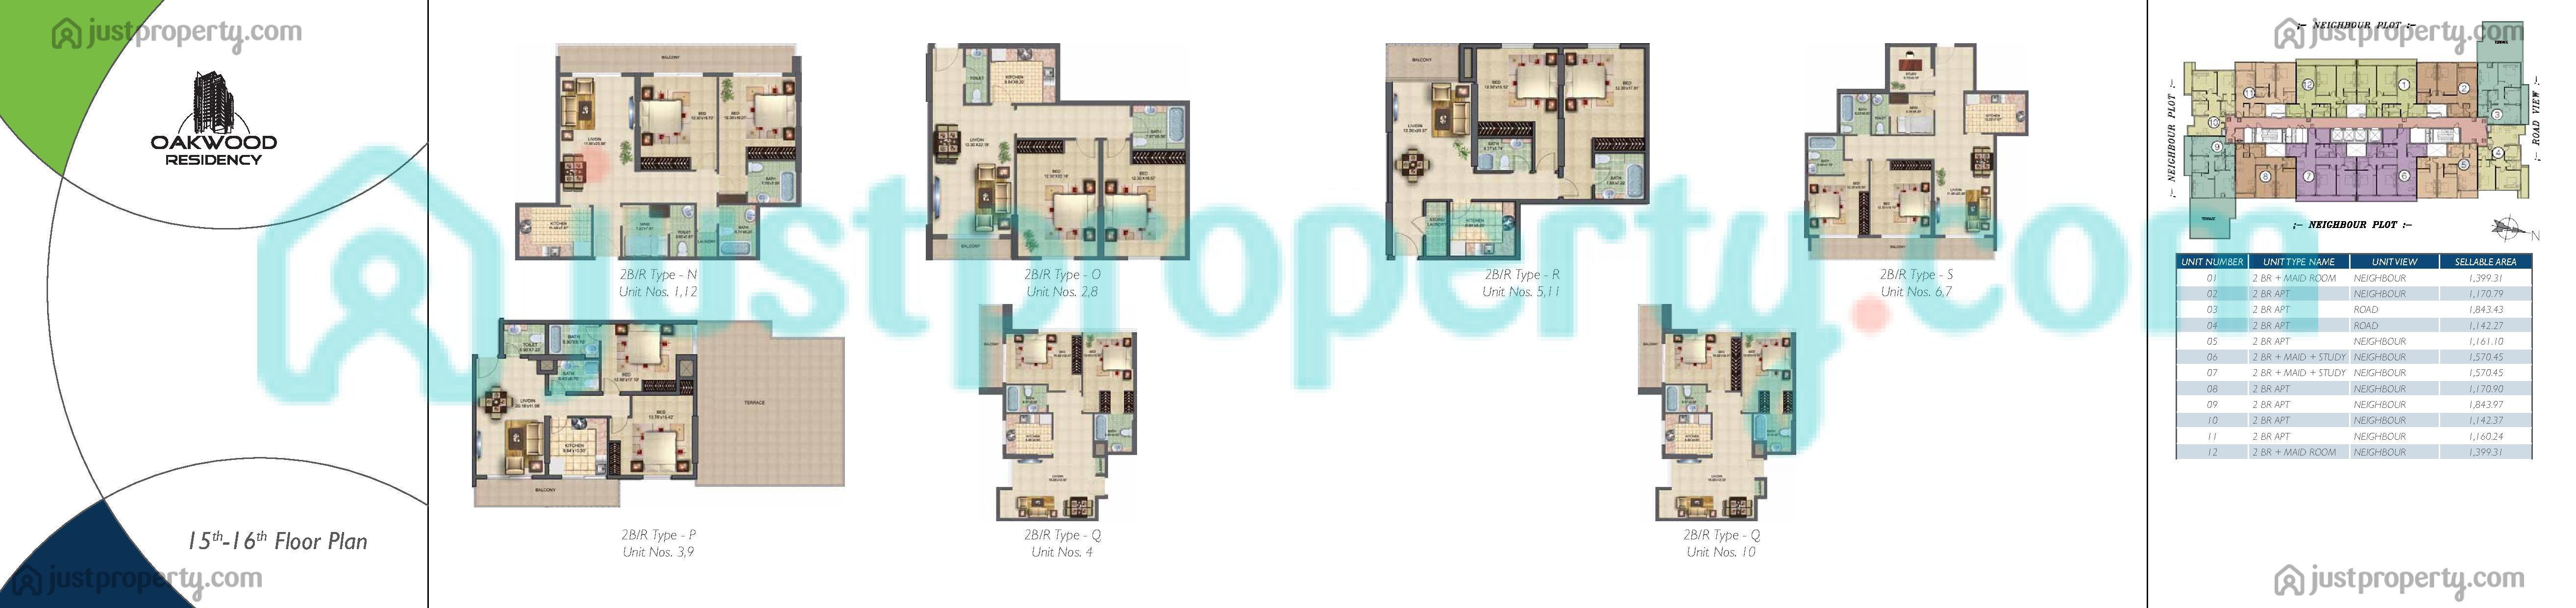 Oakwood Residency Floor Plans